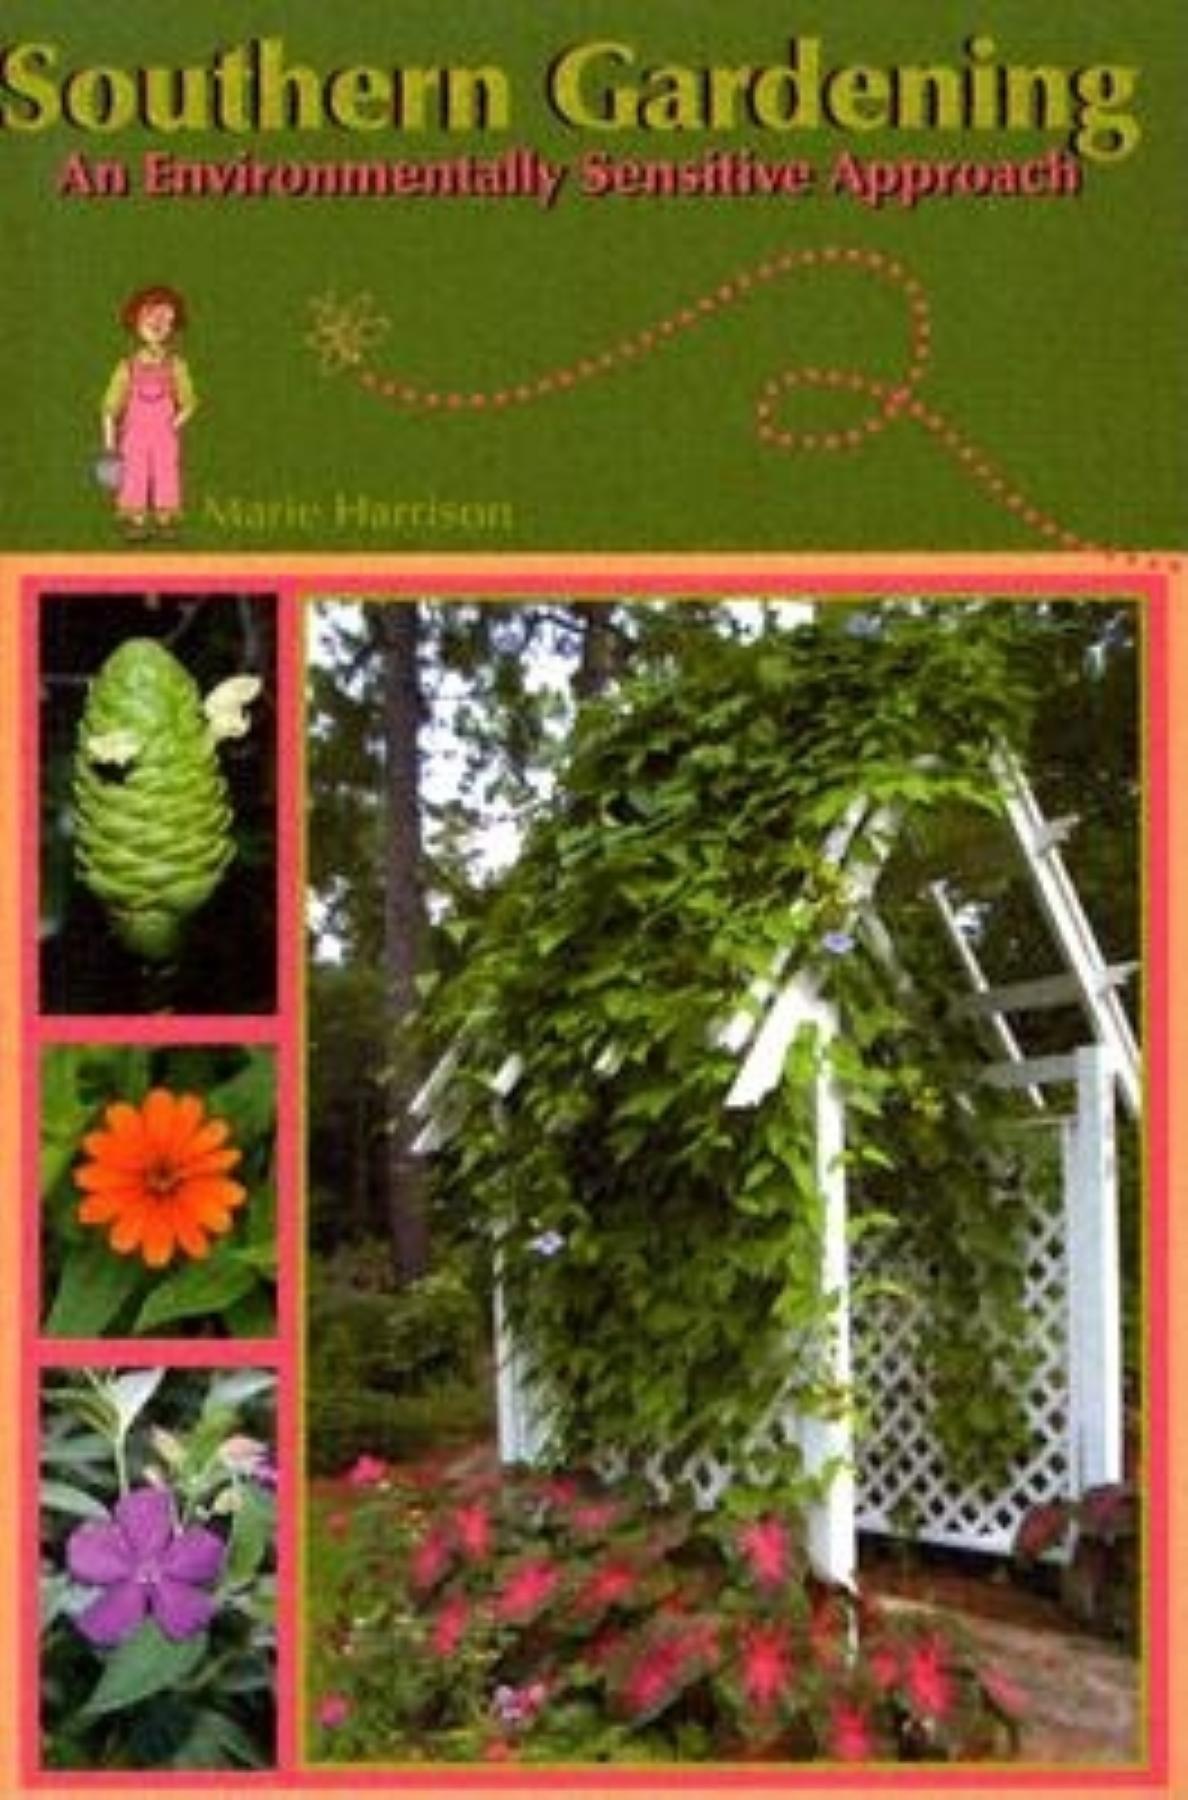 Southern Gardening: An Environmentally Sensitive Approach